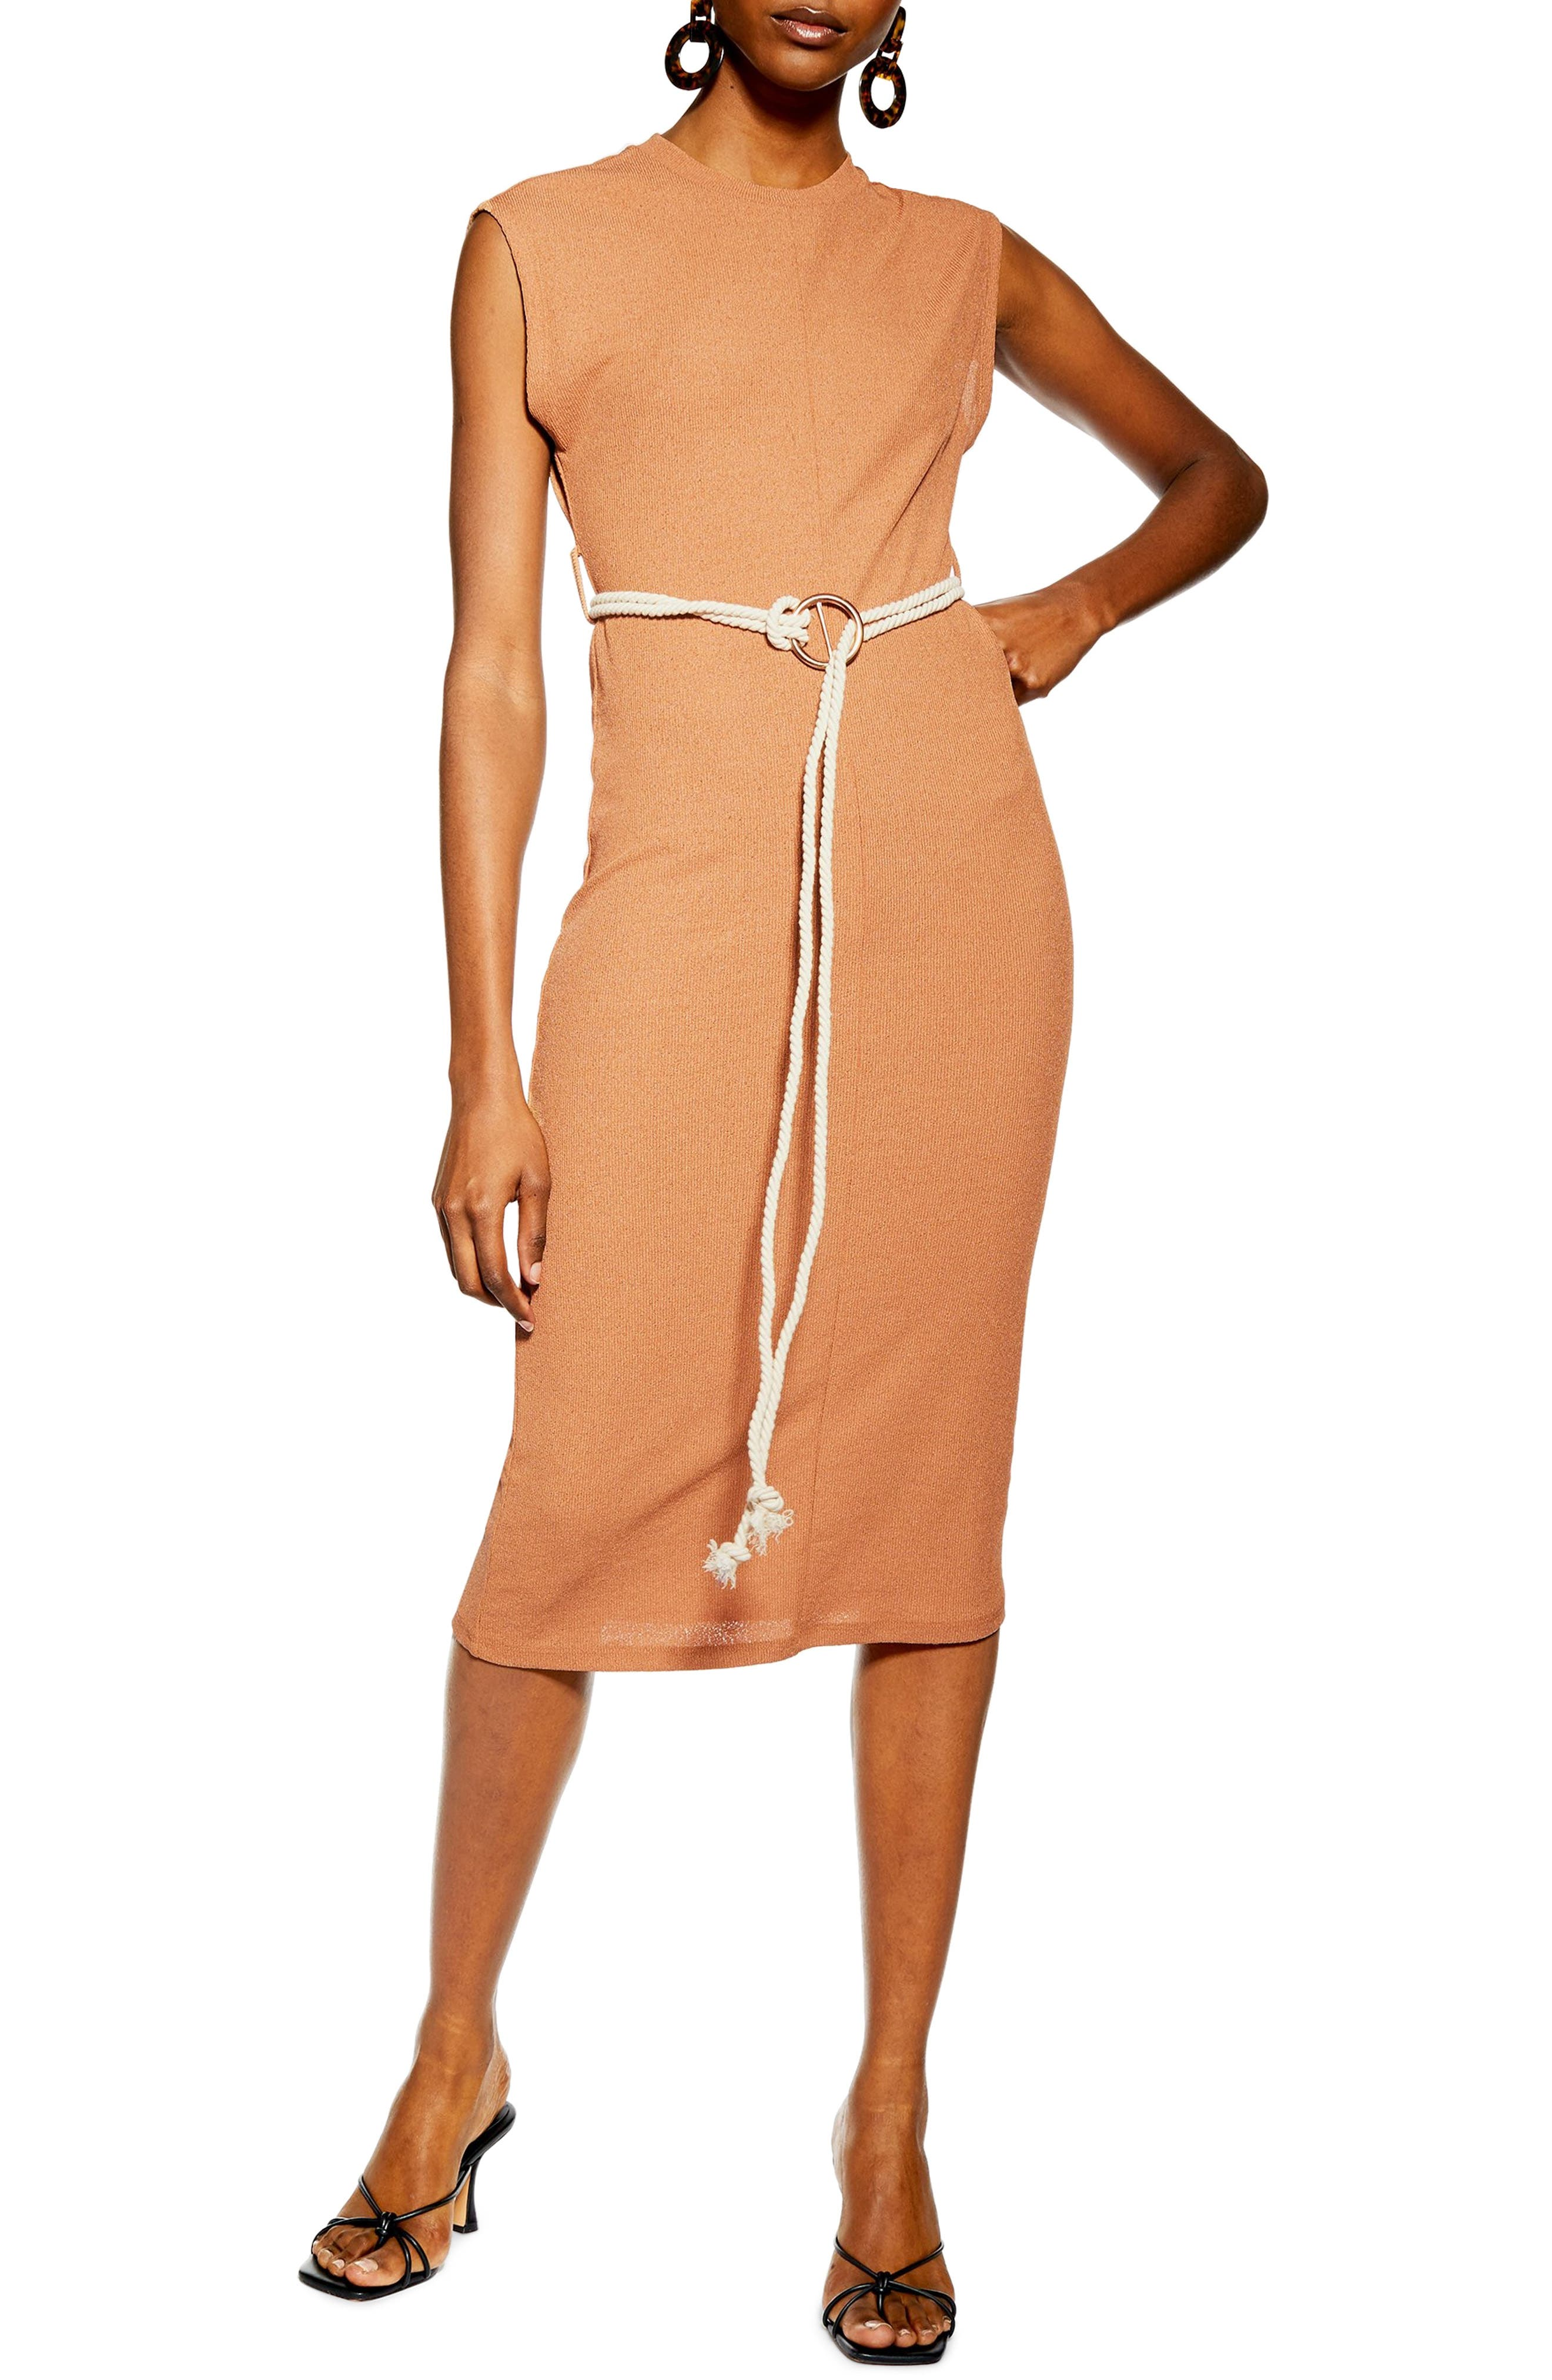 Topshop Rope Belt Midi Dress, US (fits like 2-4) - Brown